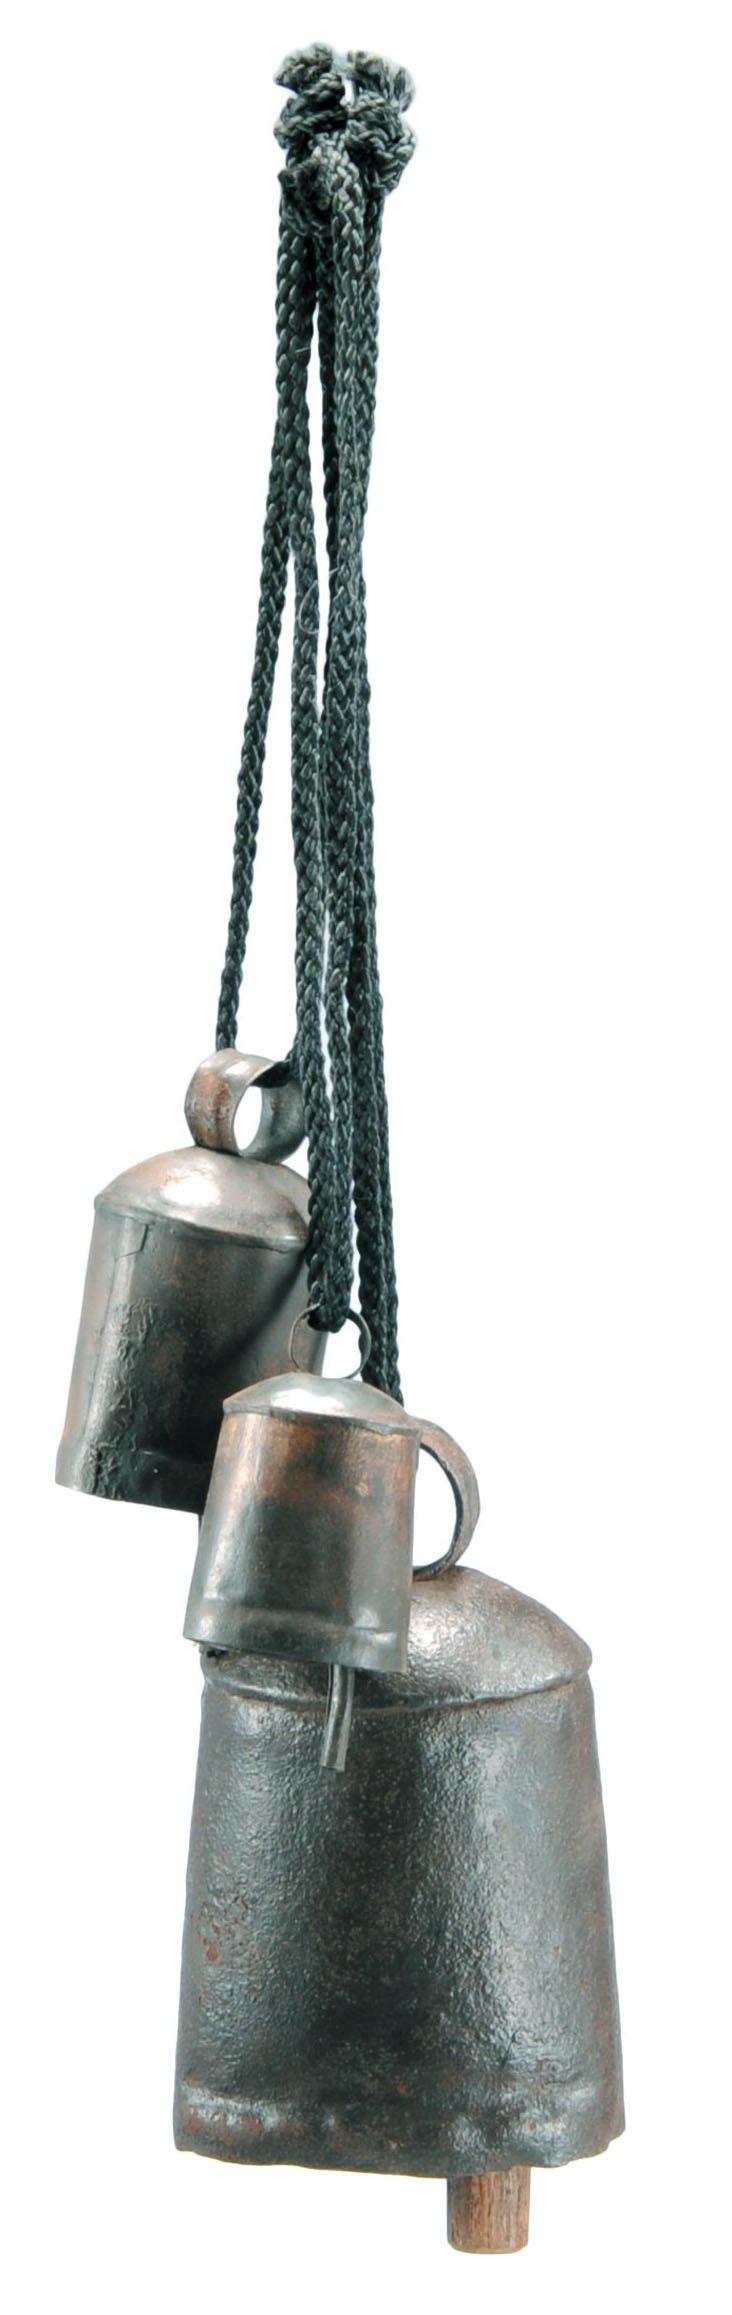 Metal Cowbells, Asst. of 3